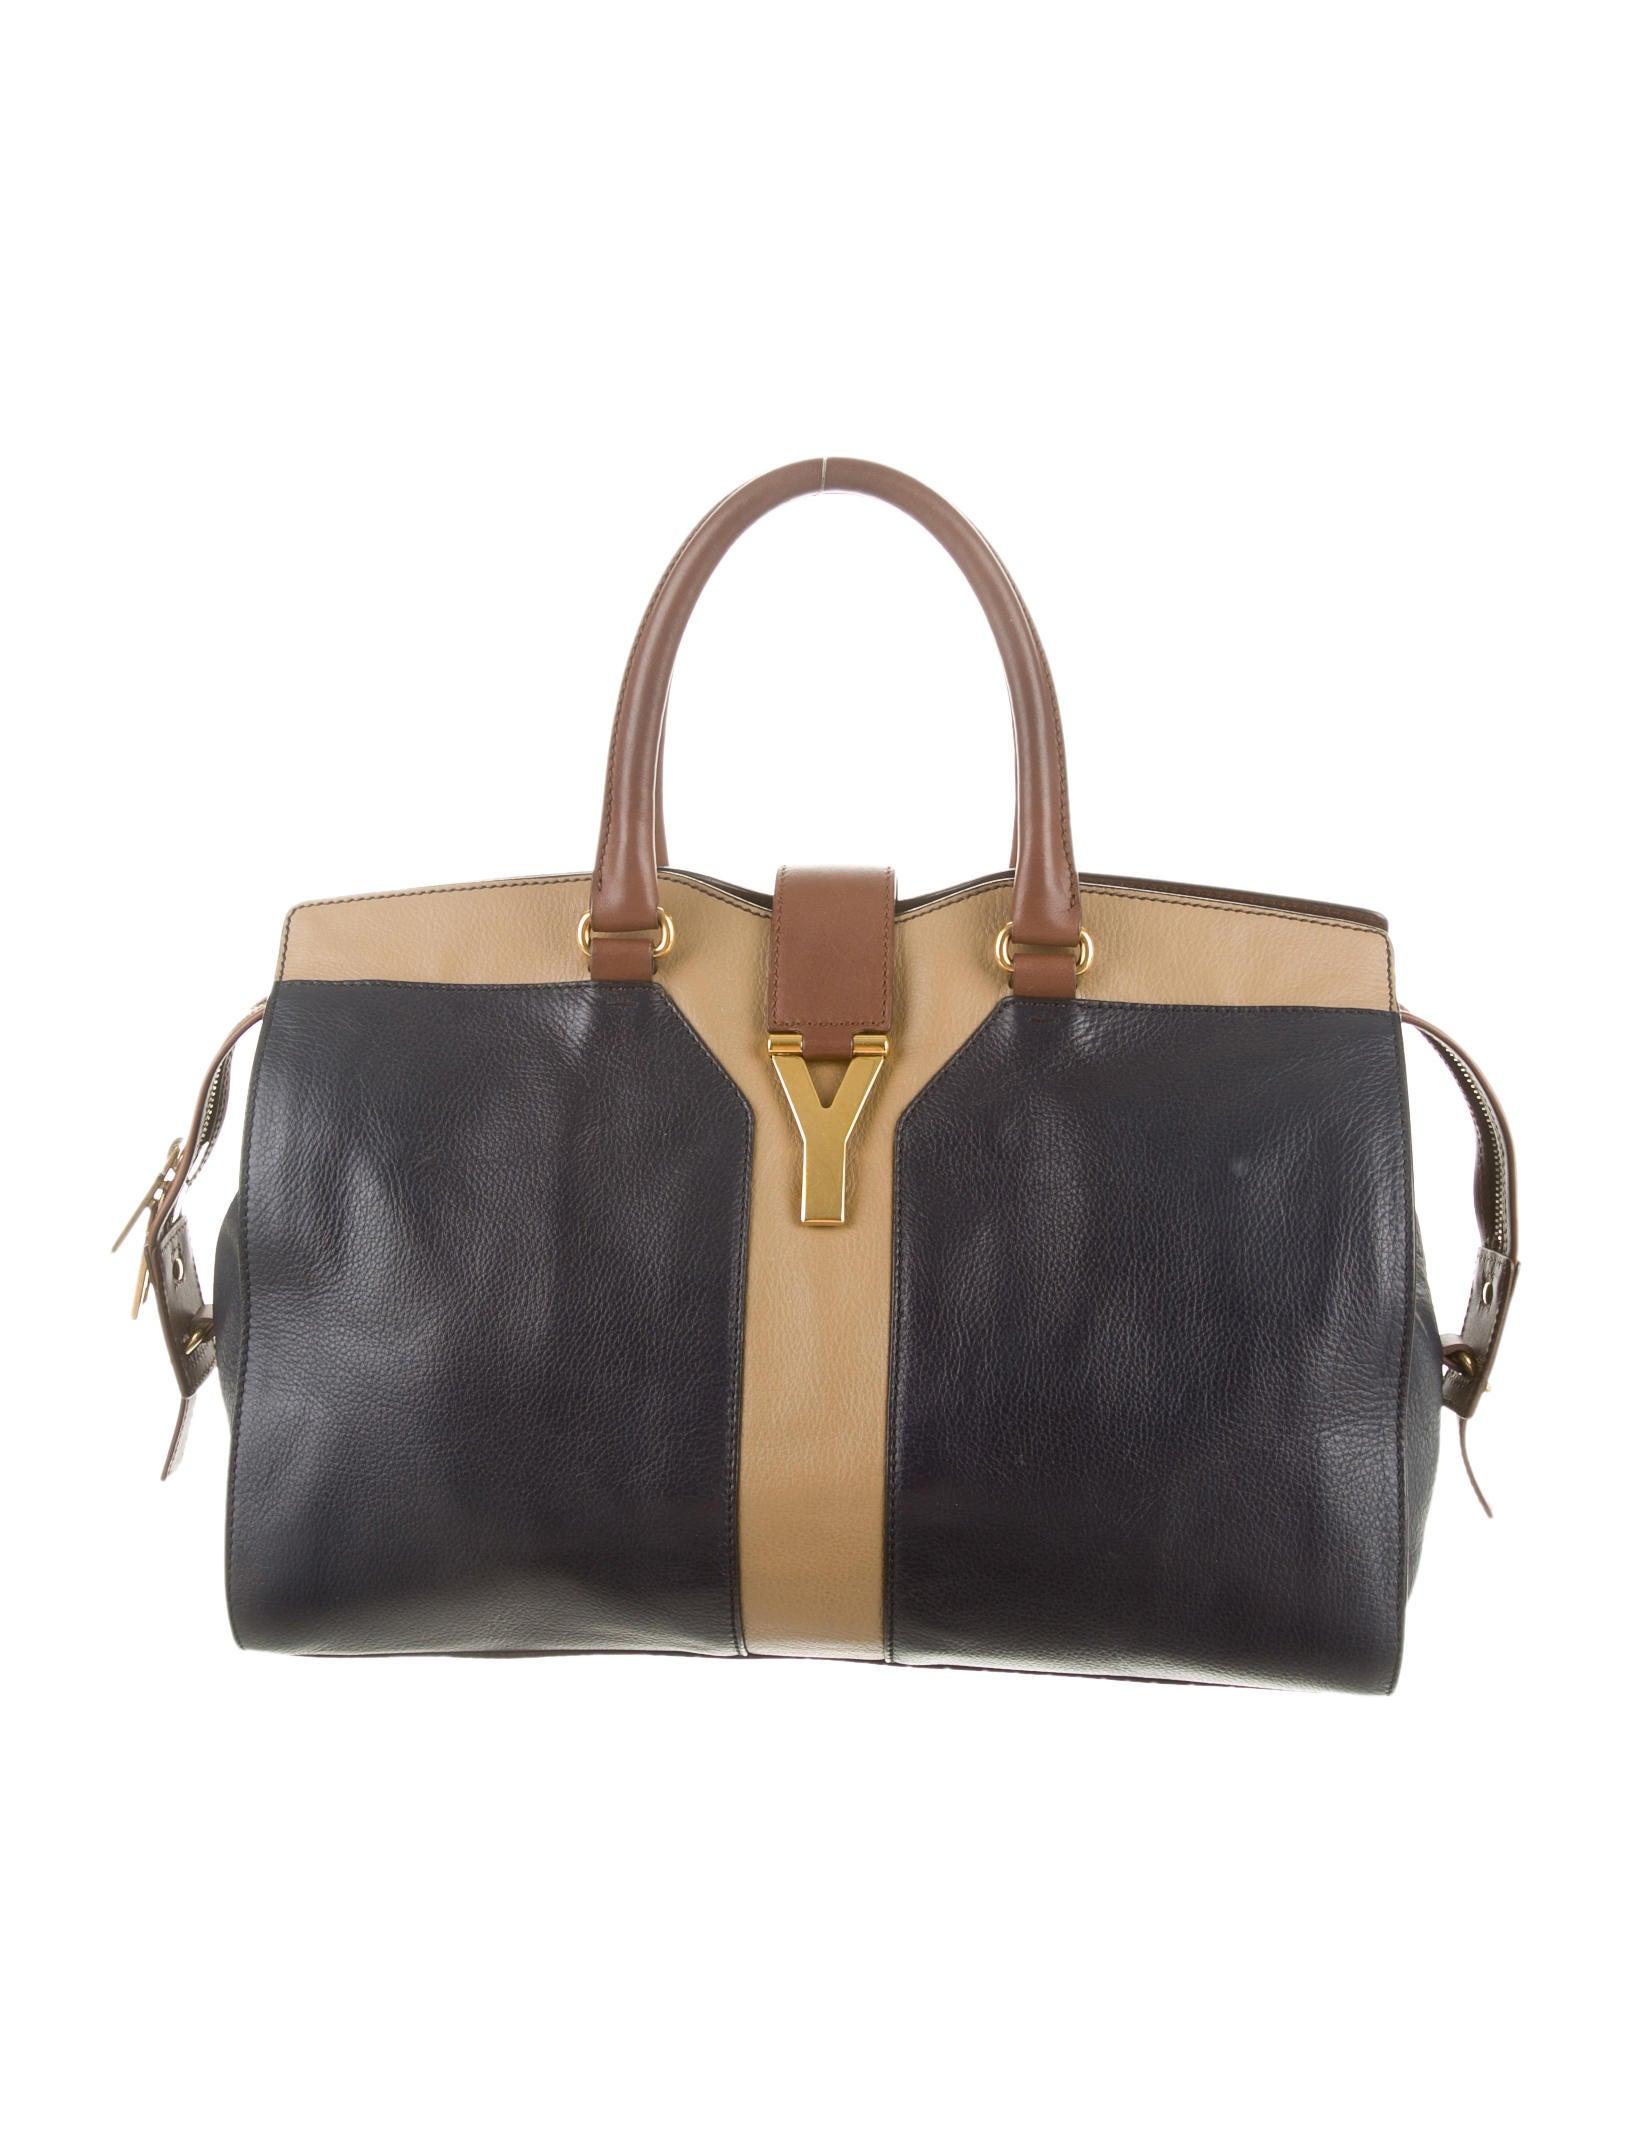 Yves Saint Laurent Cabas Chyc Bag - Handbags - YVE35501 | The RealReal